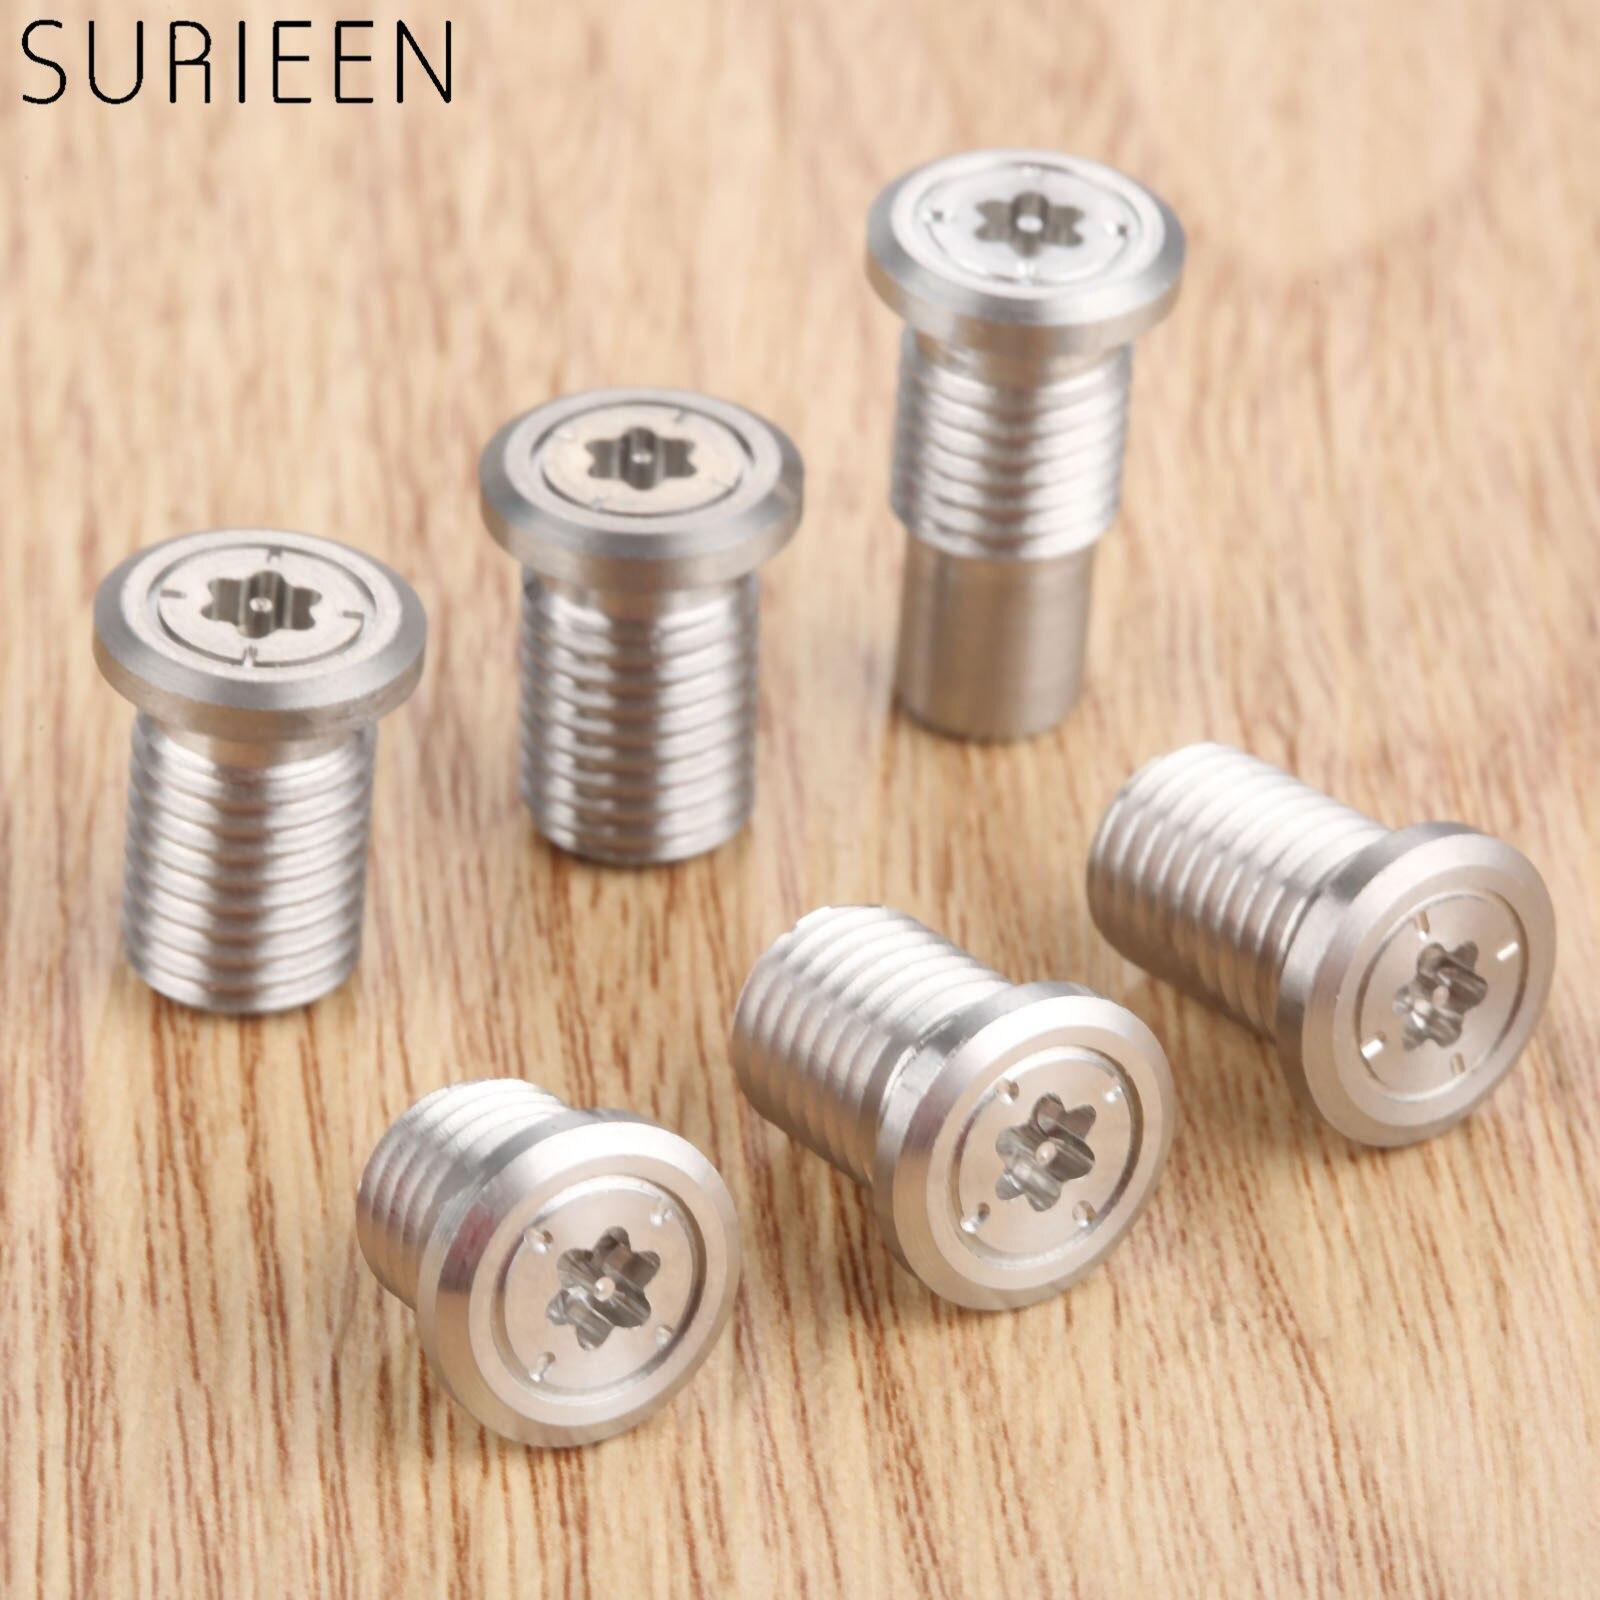 SURIEEN 1 Pc Steel Golf Weight Screw For M4 Driver Head Professional Golf Club Heads Accessories 2g/4g/6g/7g/9g/10g